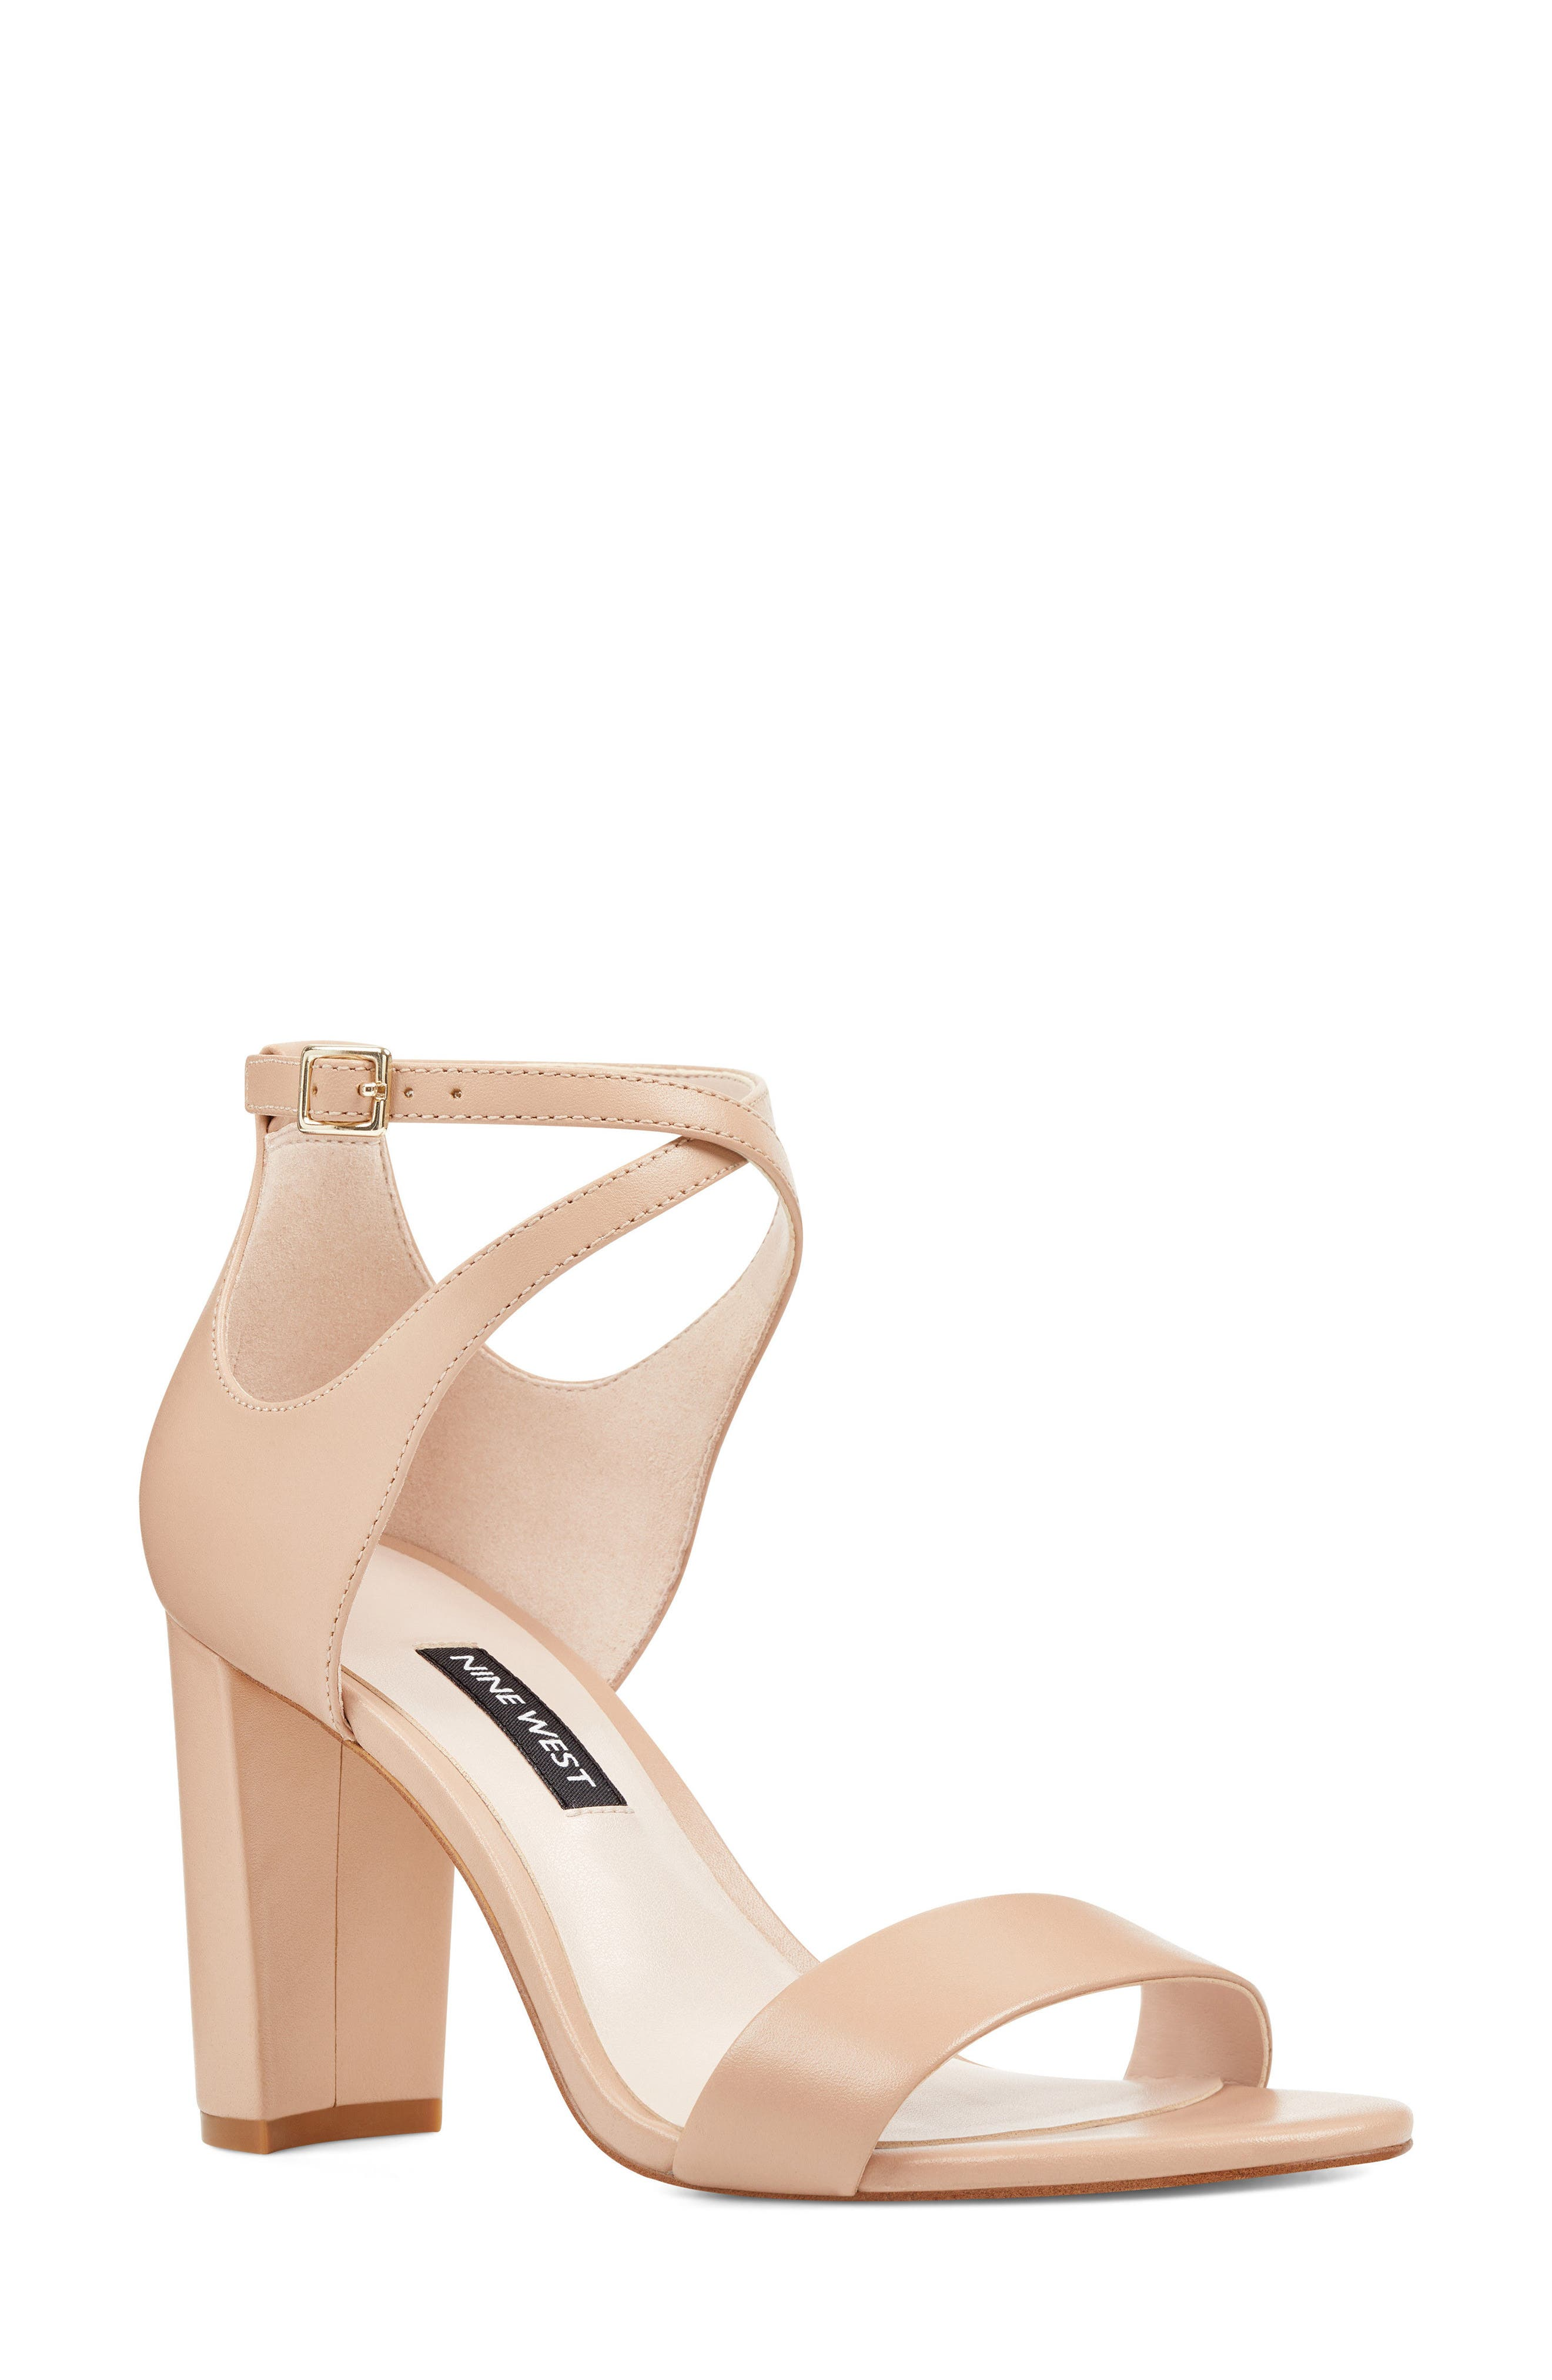 Nunzaya Ankle Strap Sandal,                         Main,                         color, 270